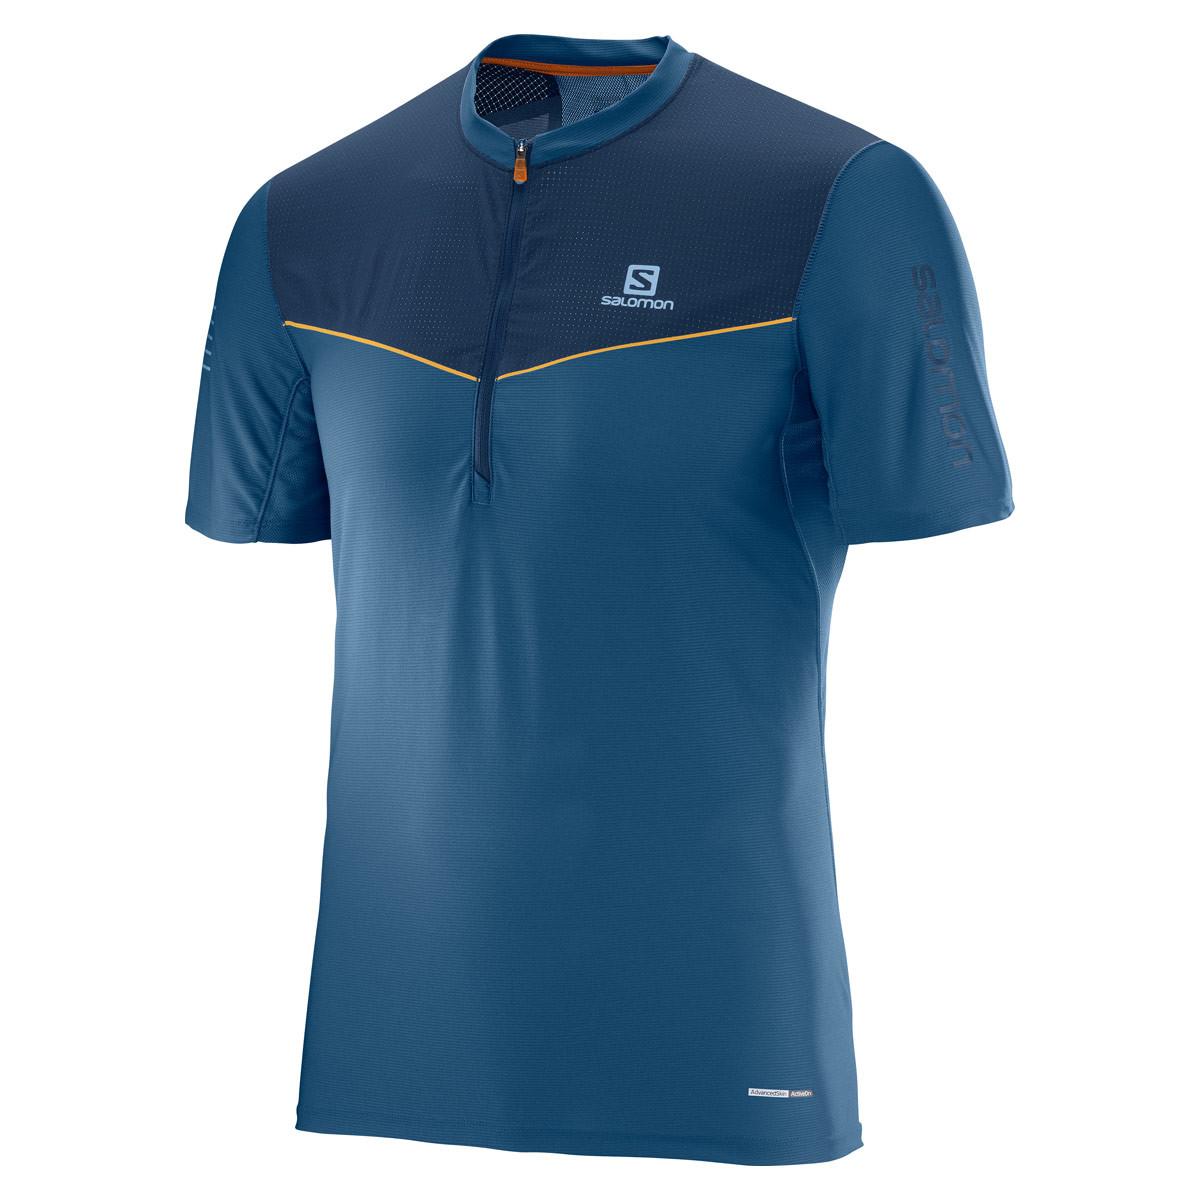 Salomon Fast Wing HZ Short Sleeve Tee - Running tops for Men - Blue ... 645dbea804e30